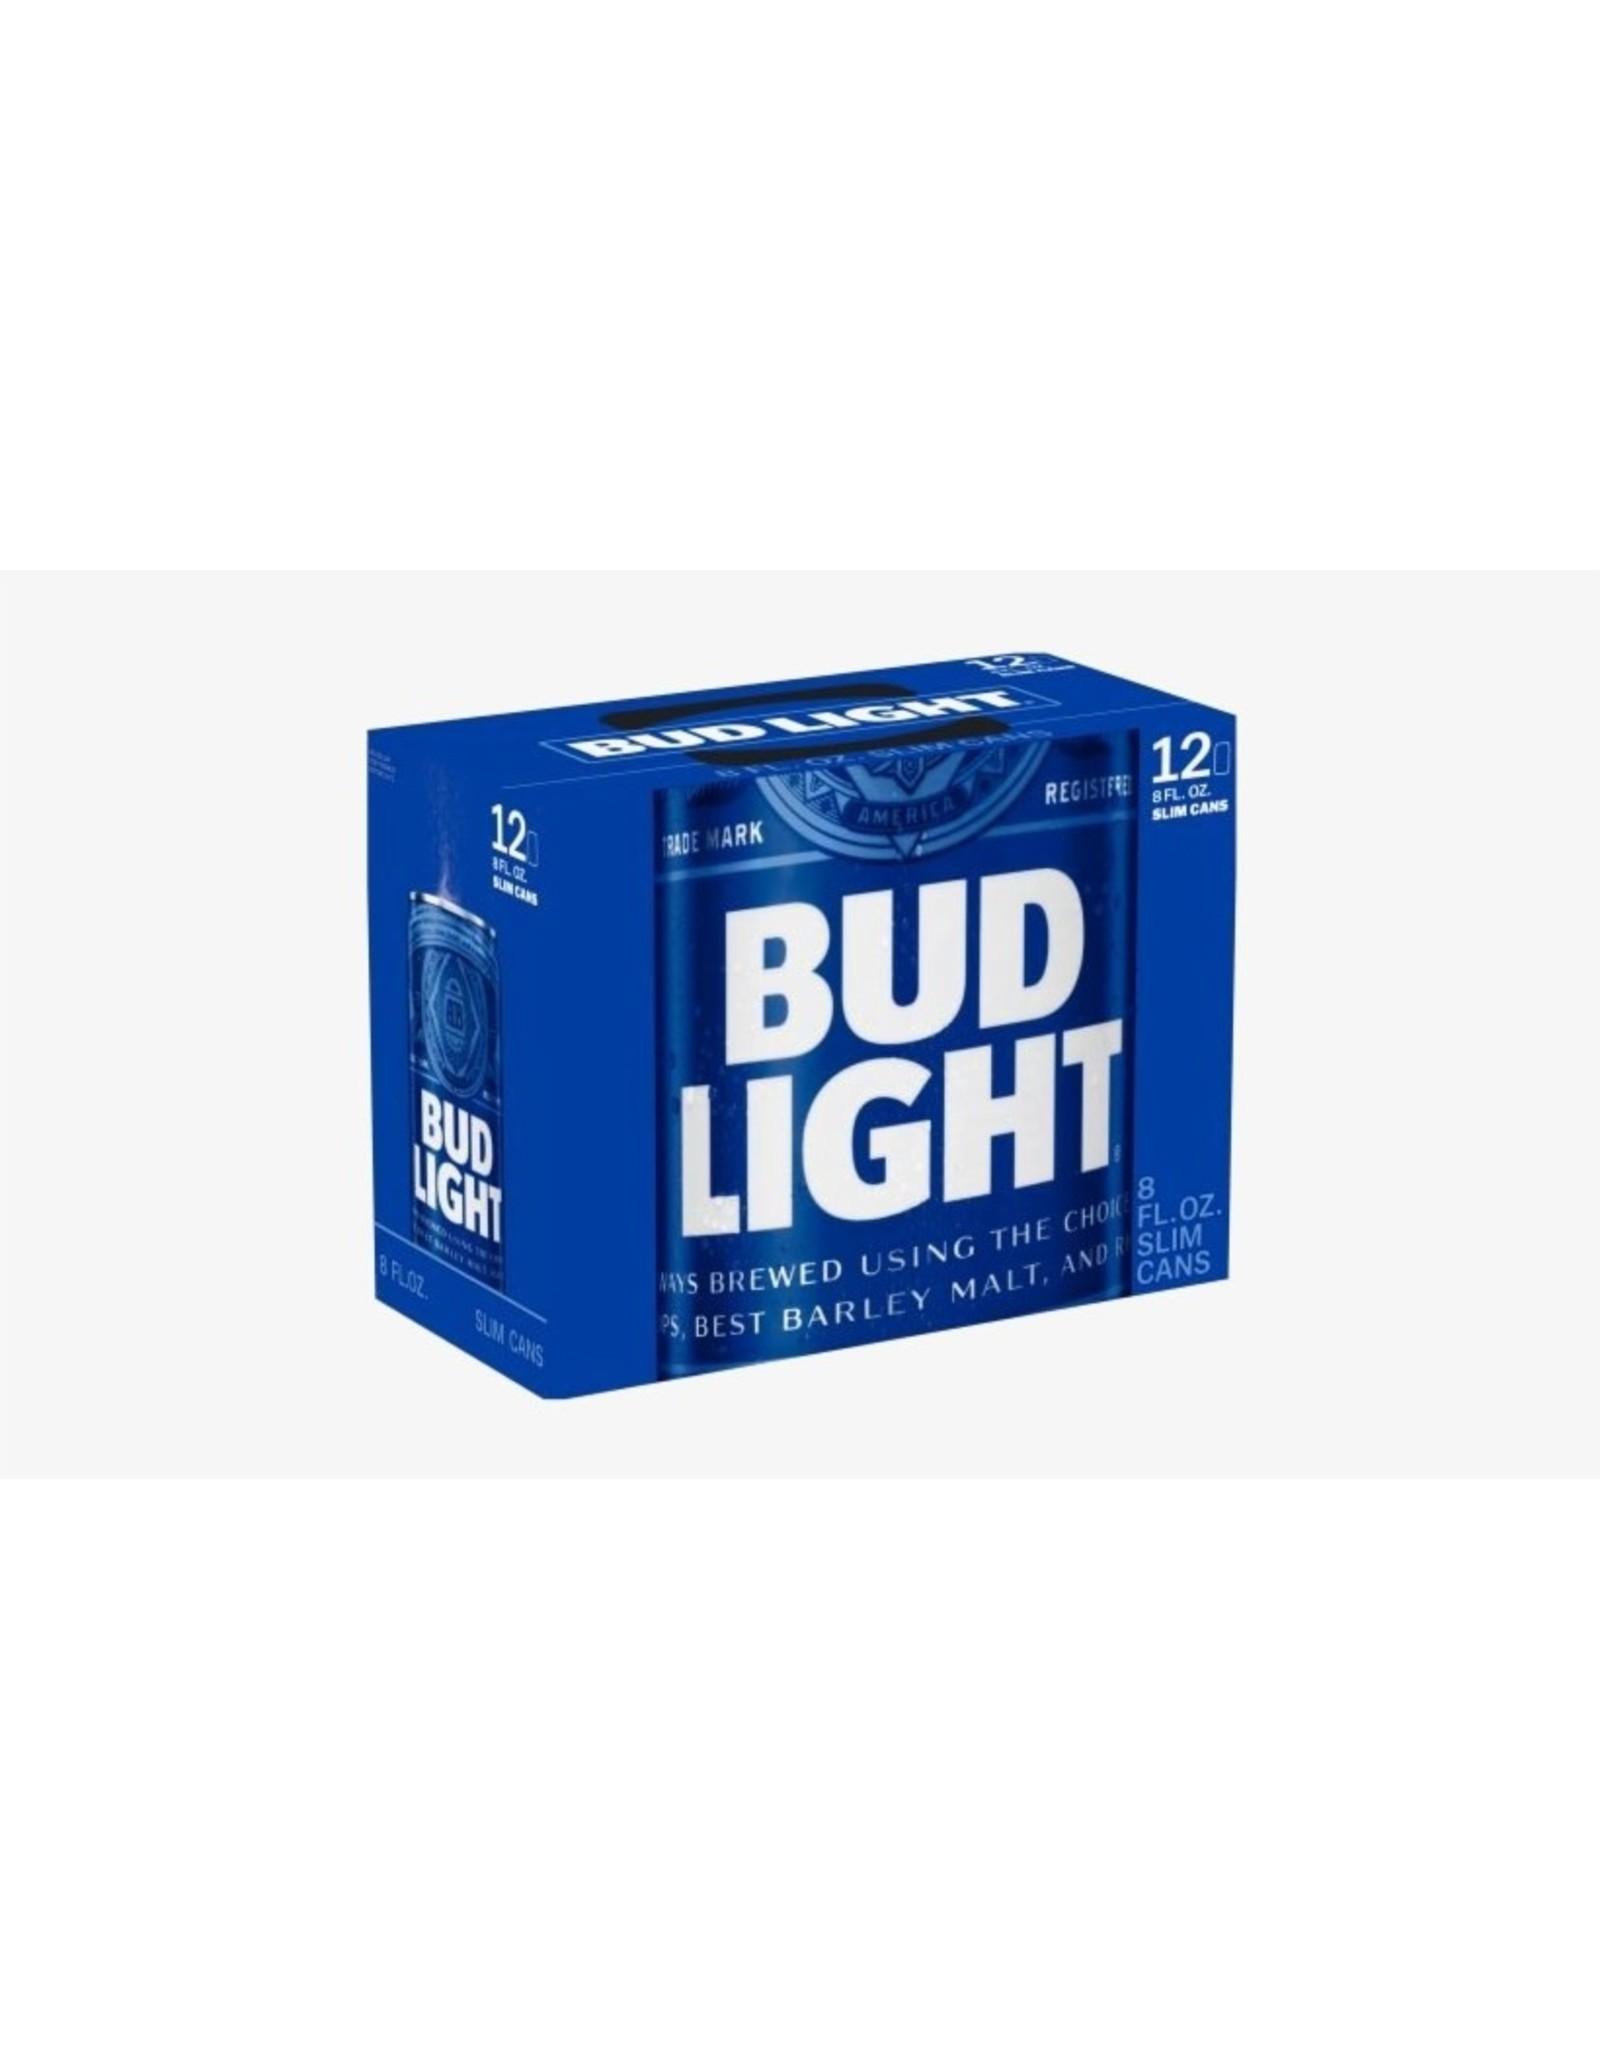 BUD LIGHT 2-12 CAN